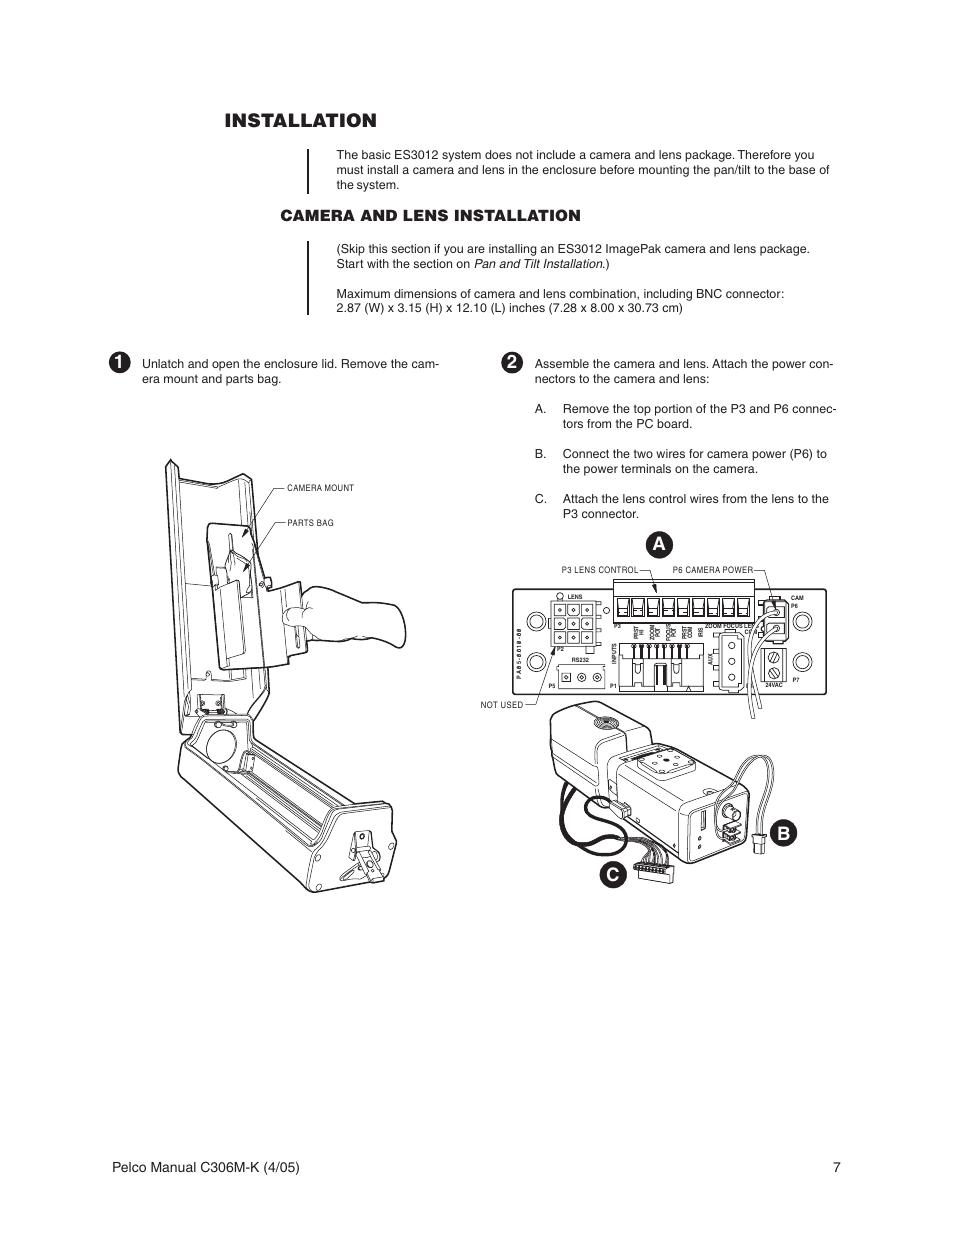 medium resolution of installation camera and lens installation ab c 1 pelco esprit es3012 user manual page 7 40